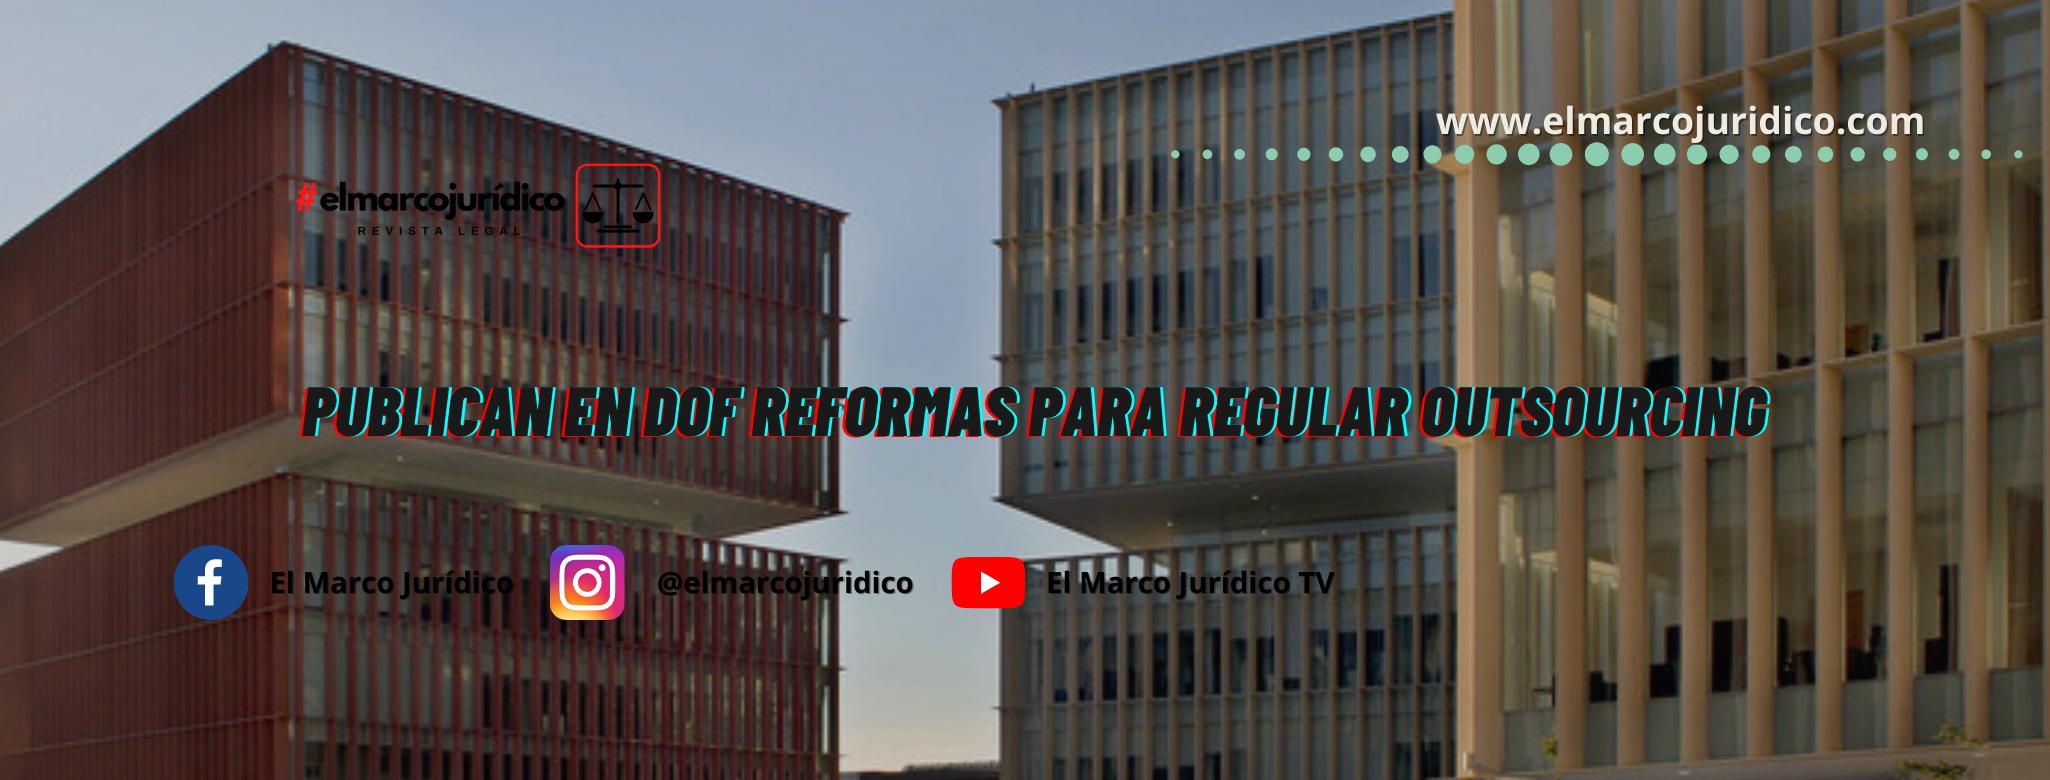 Publican en DOF reformas para regular Outsourcing